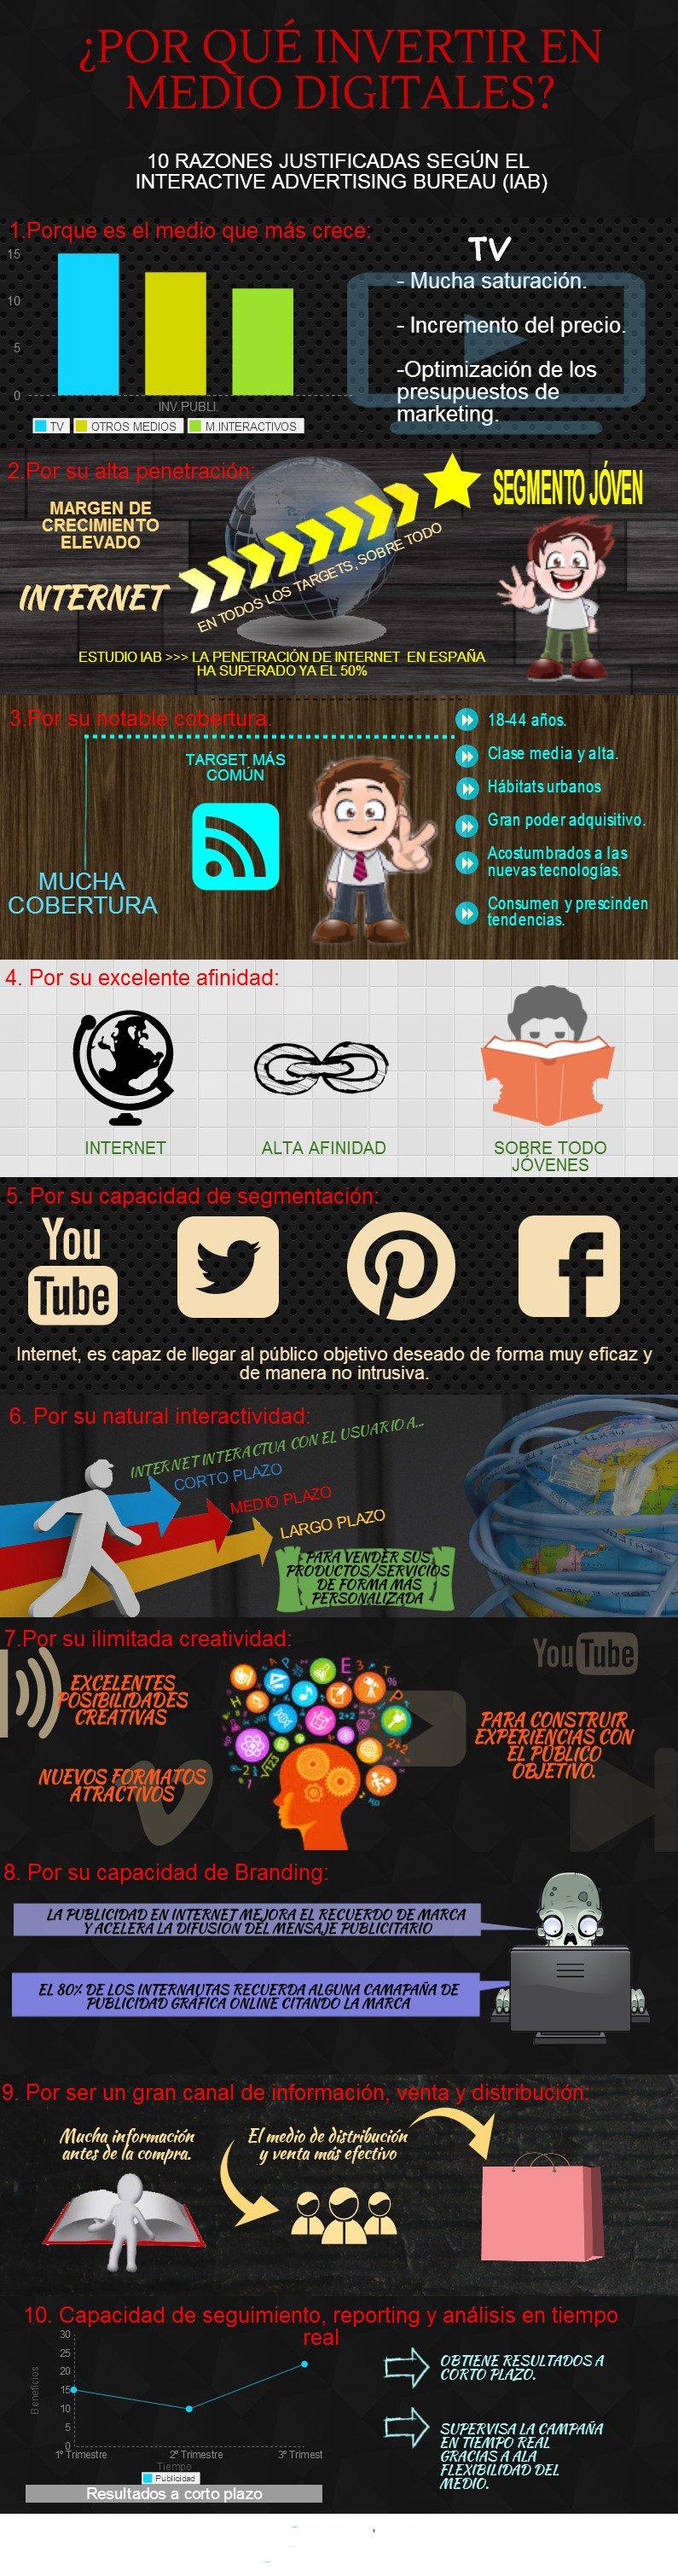 #Infografia #MarketingDigital ¿Por qué invertir en medios digitales? #TAVnews